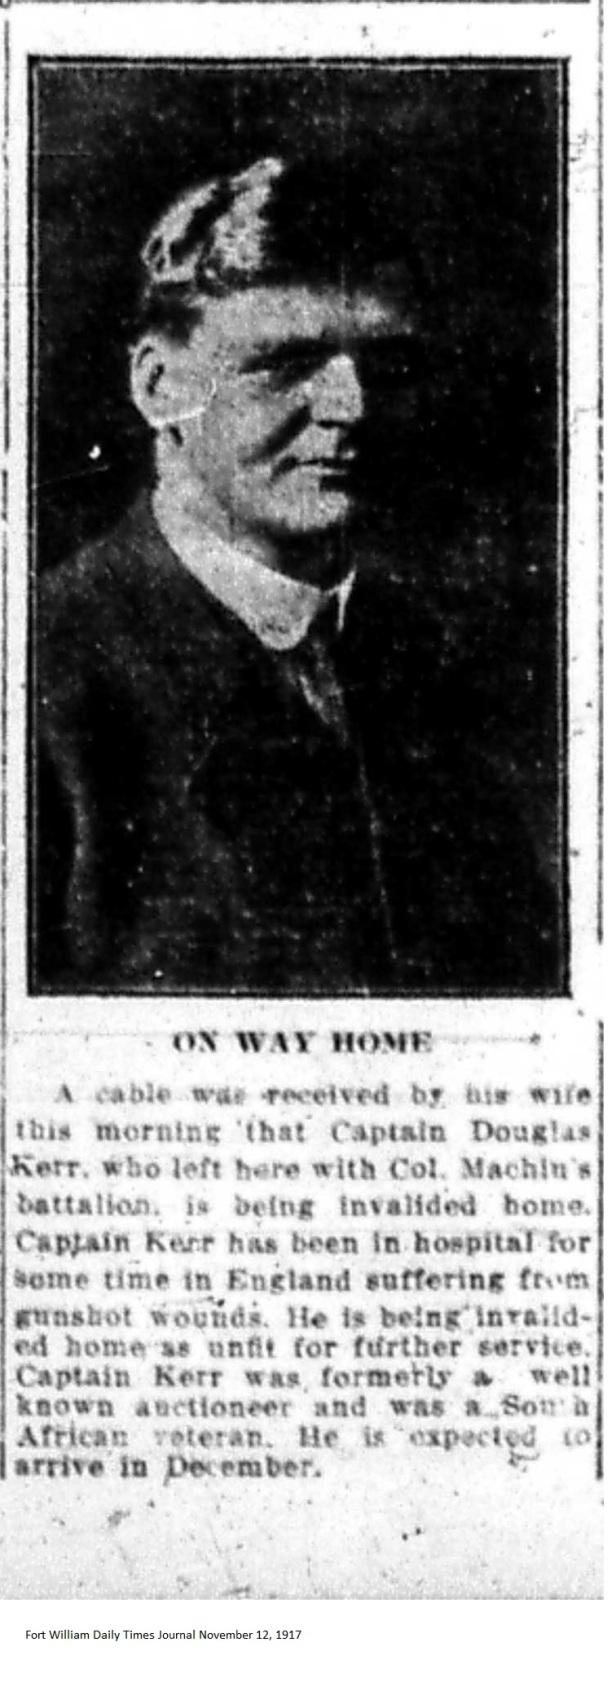 FWDTJ November 12, 1917 - Kerr